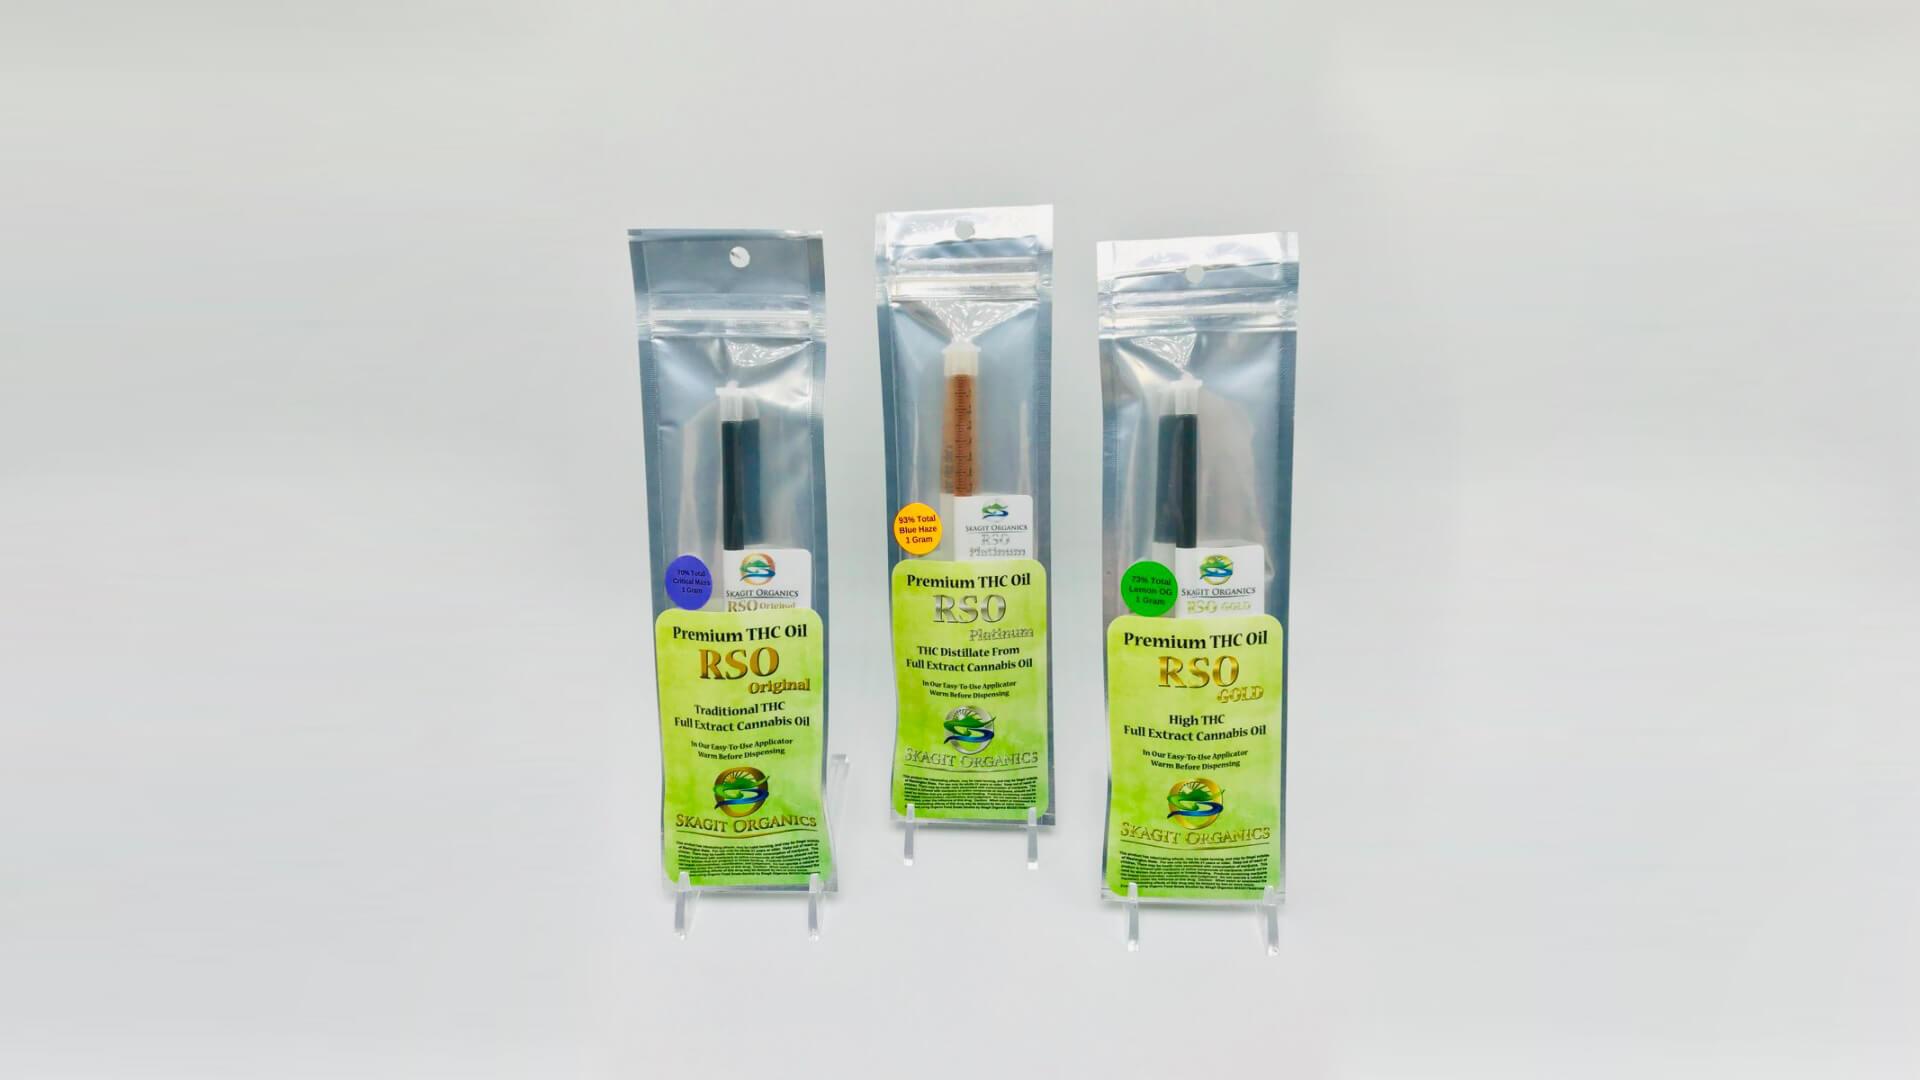 Skagit Organics RSO Oils